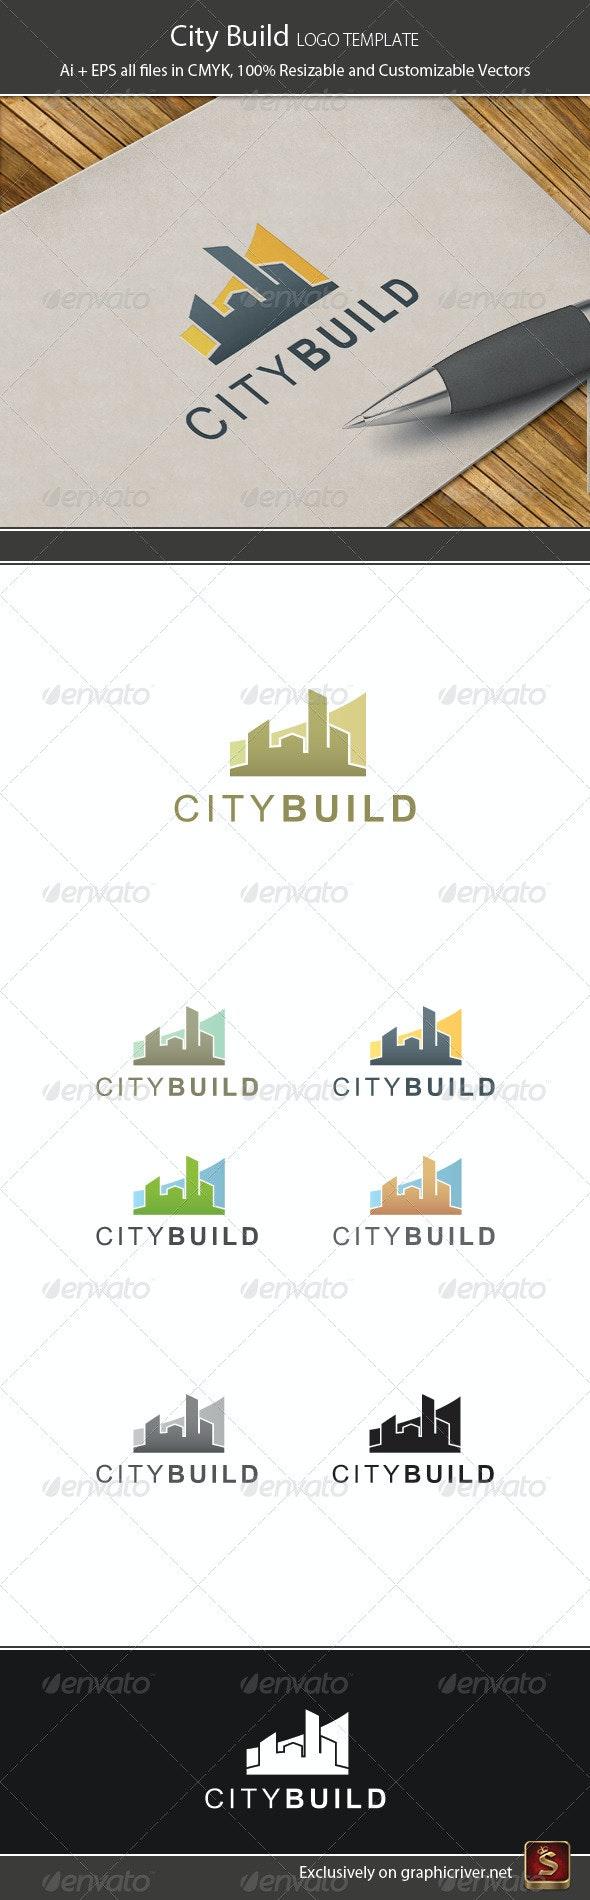 City Build Logo Temlate - Buildings Logo Templates